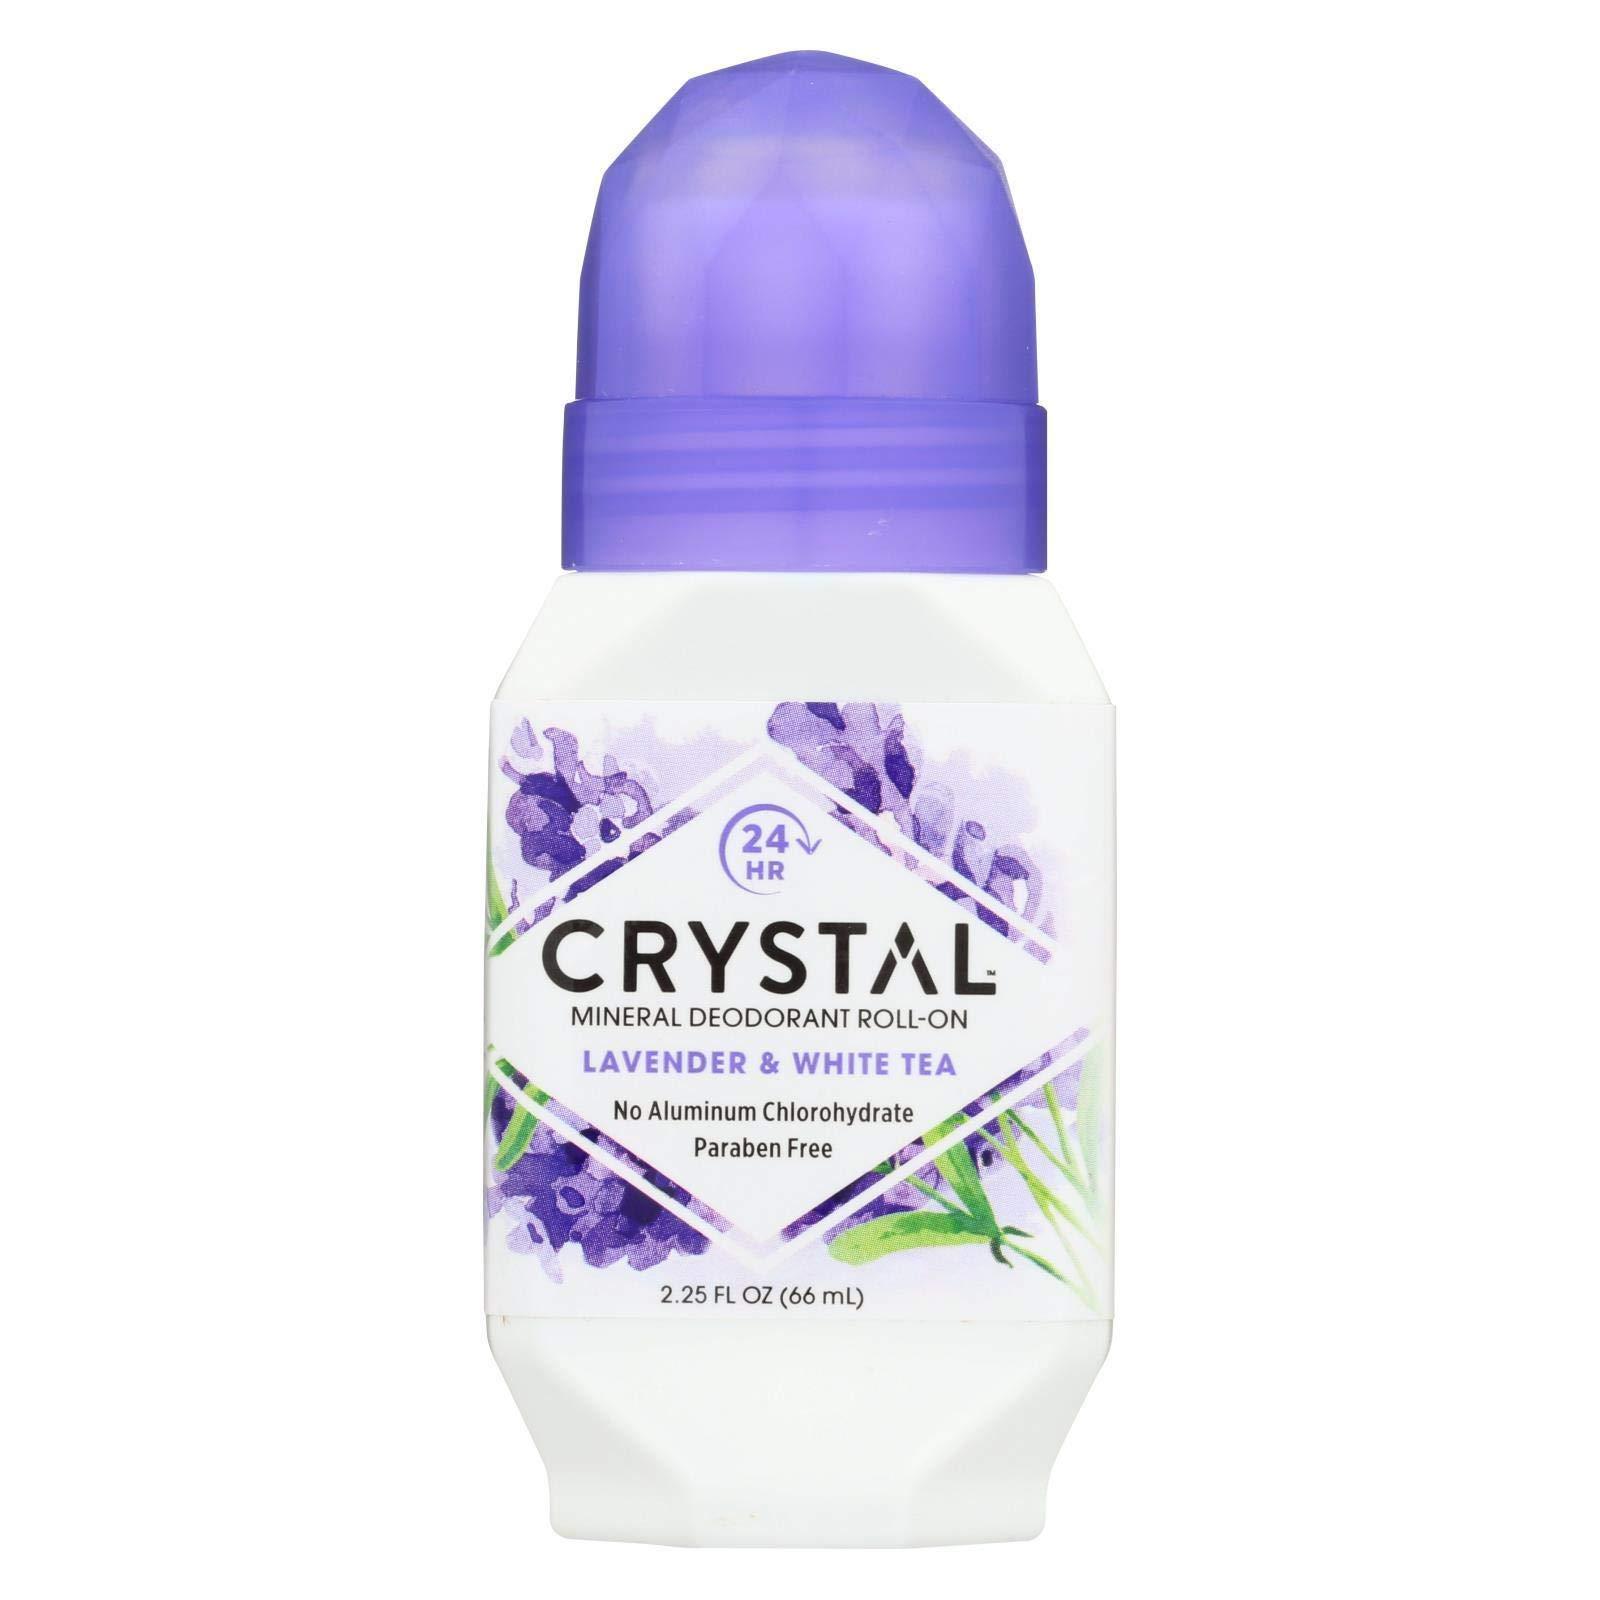 Crystal essence Deodorant Roll-On, Lavender and White Tea 2.25 fl. oz